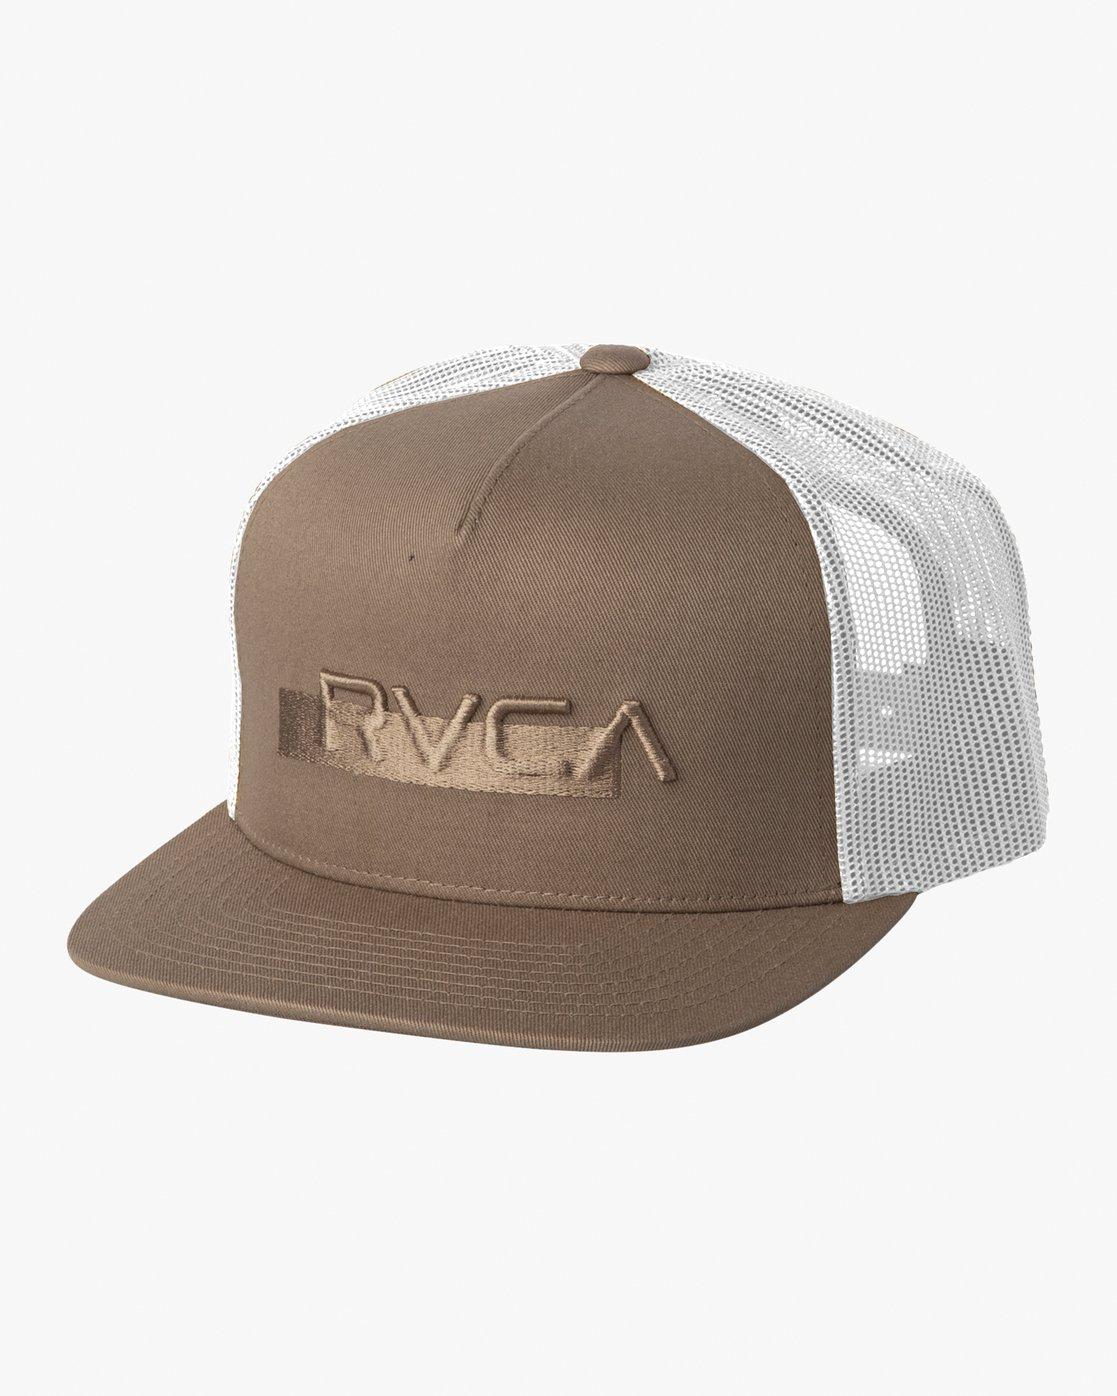 0 OVERLAY TRUCKER White MAHW3ROT RVCA